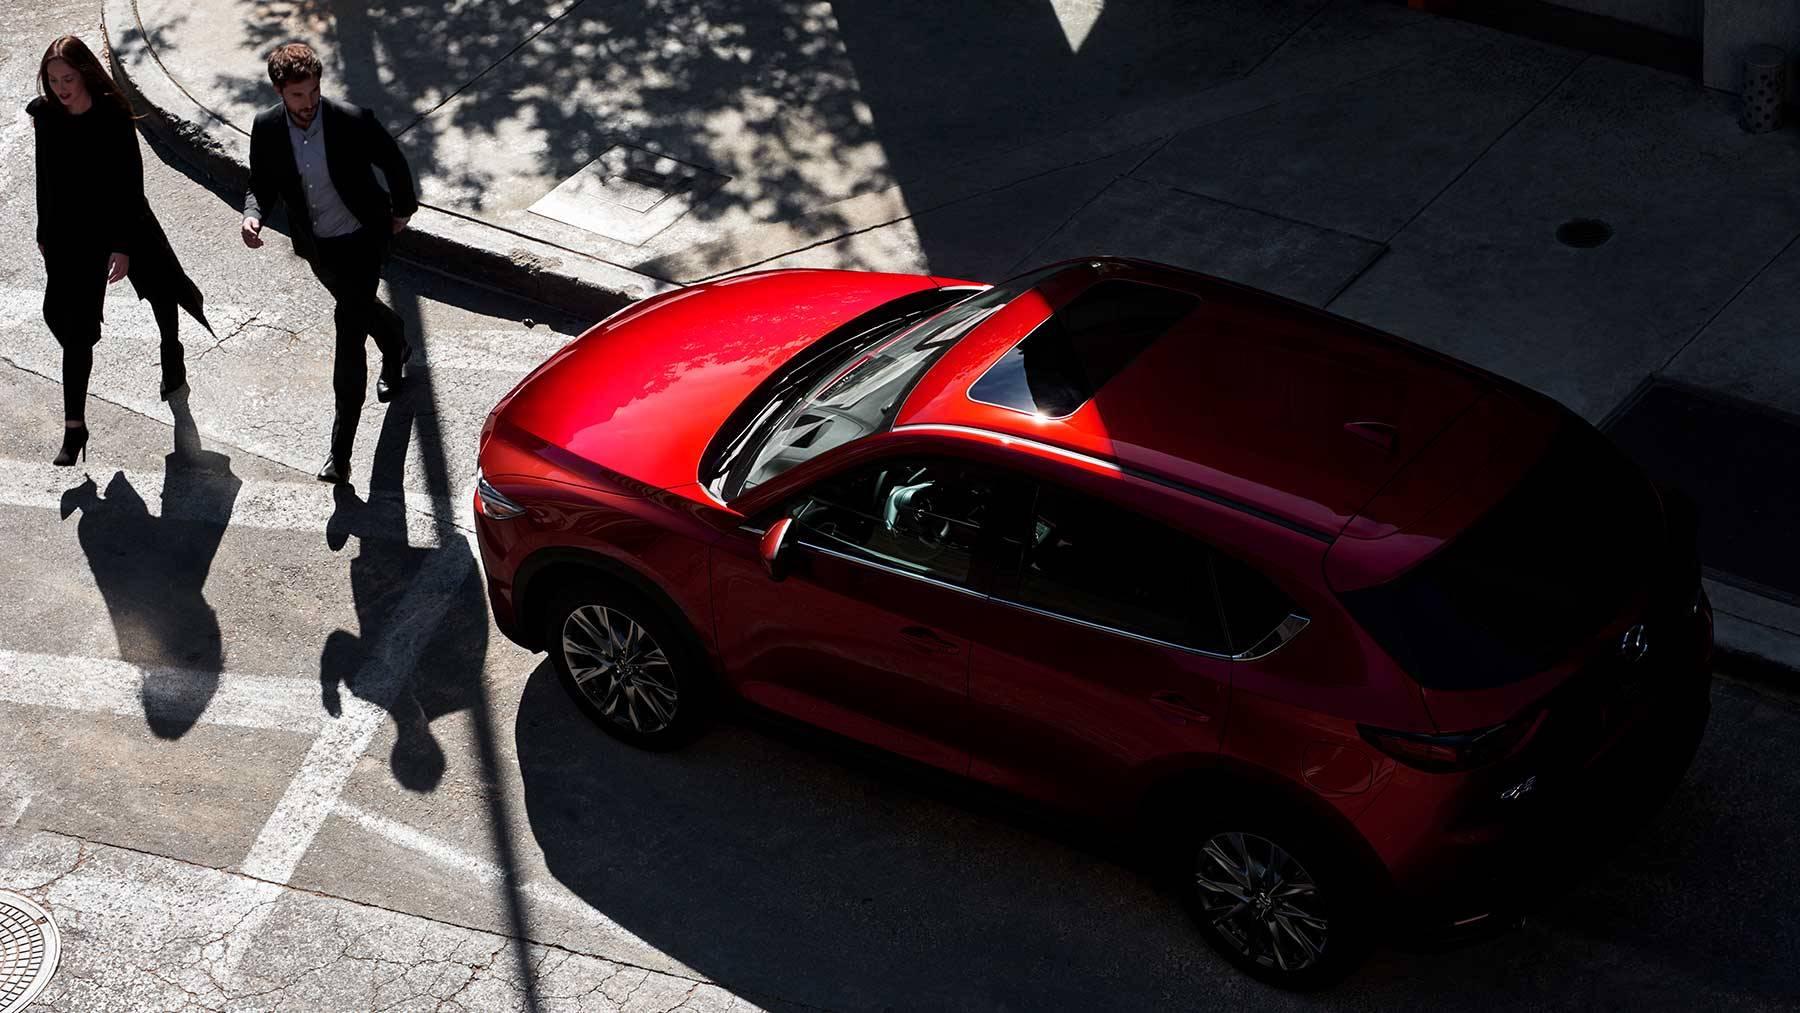 2019 Mazda CX-5 Financing near Cibolo, TX